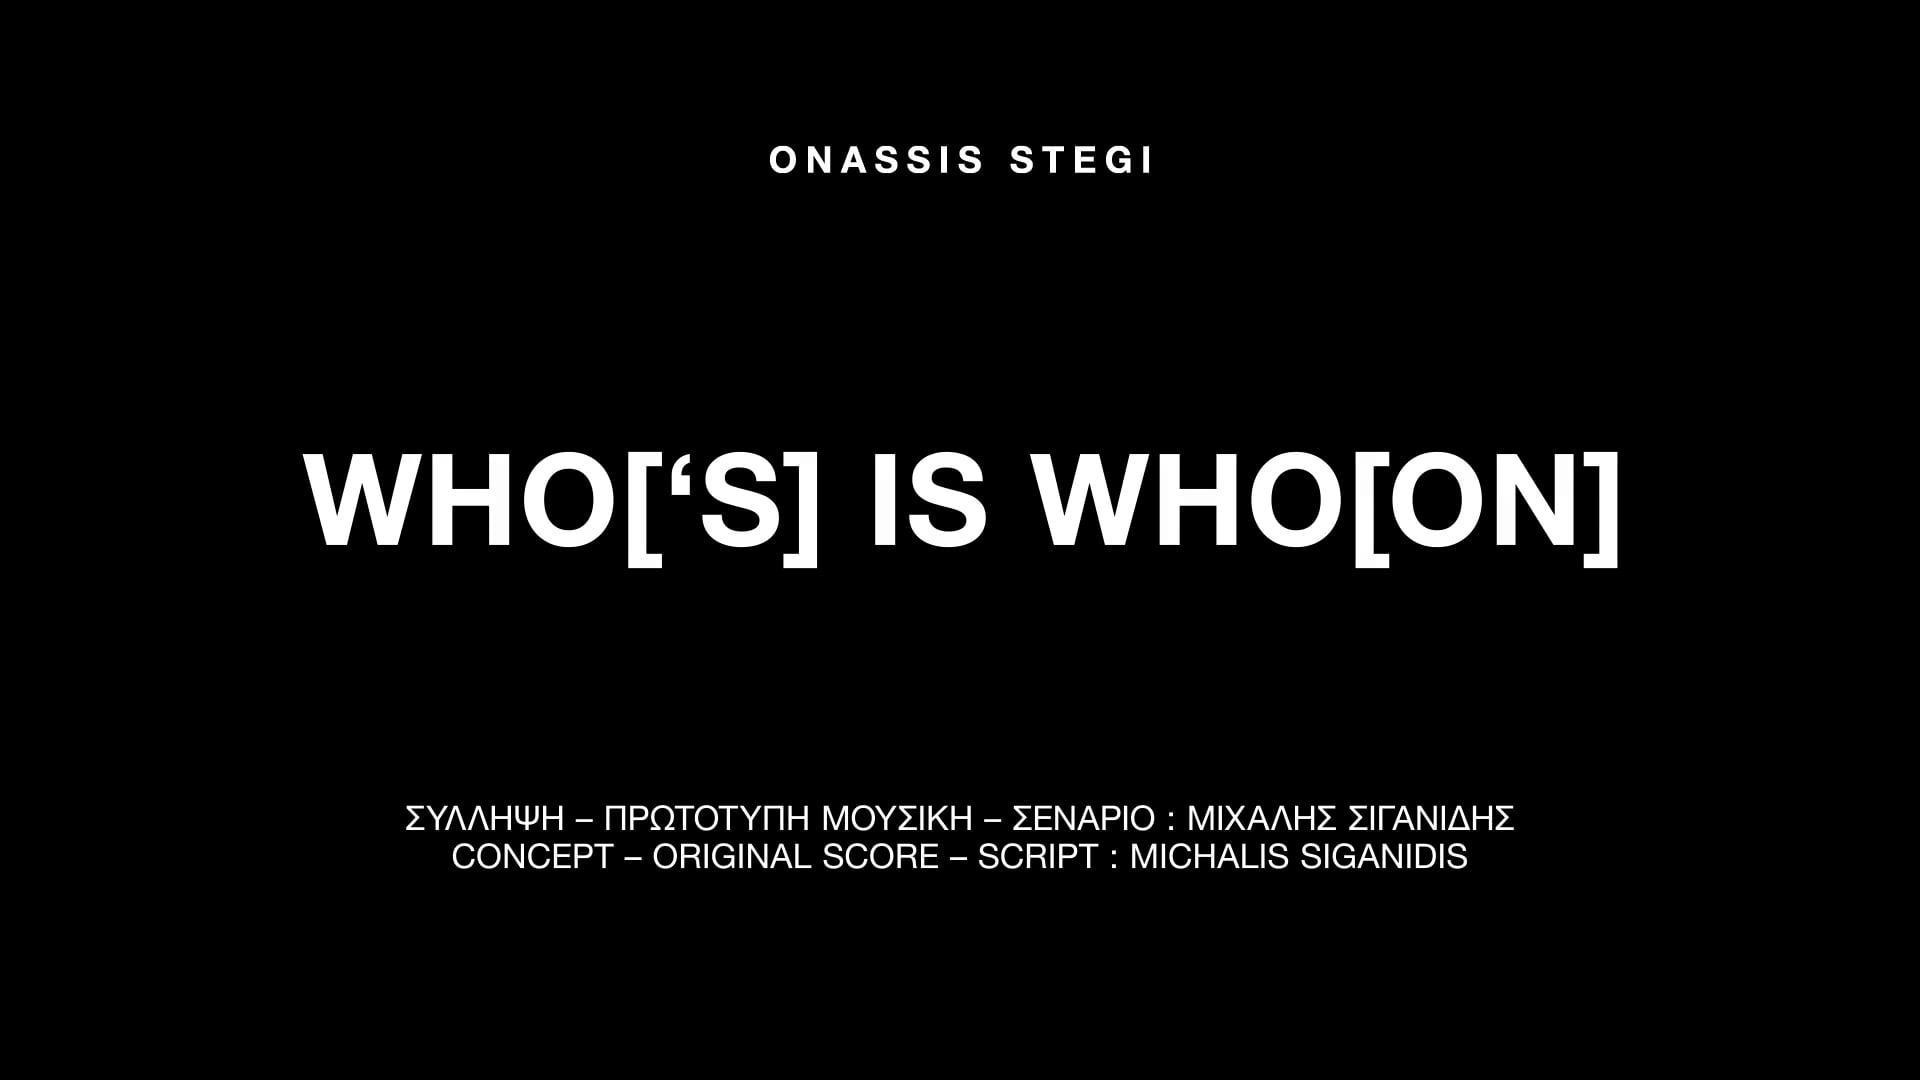 Michalis Siganidis | WHO['S] IS WHO[ON] | Onassis Stegi | Trailer